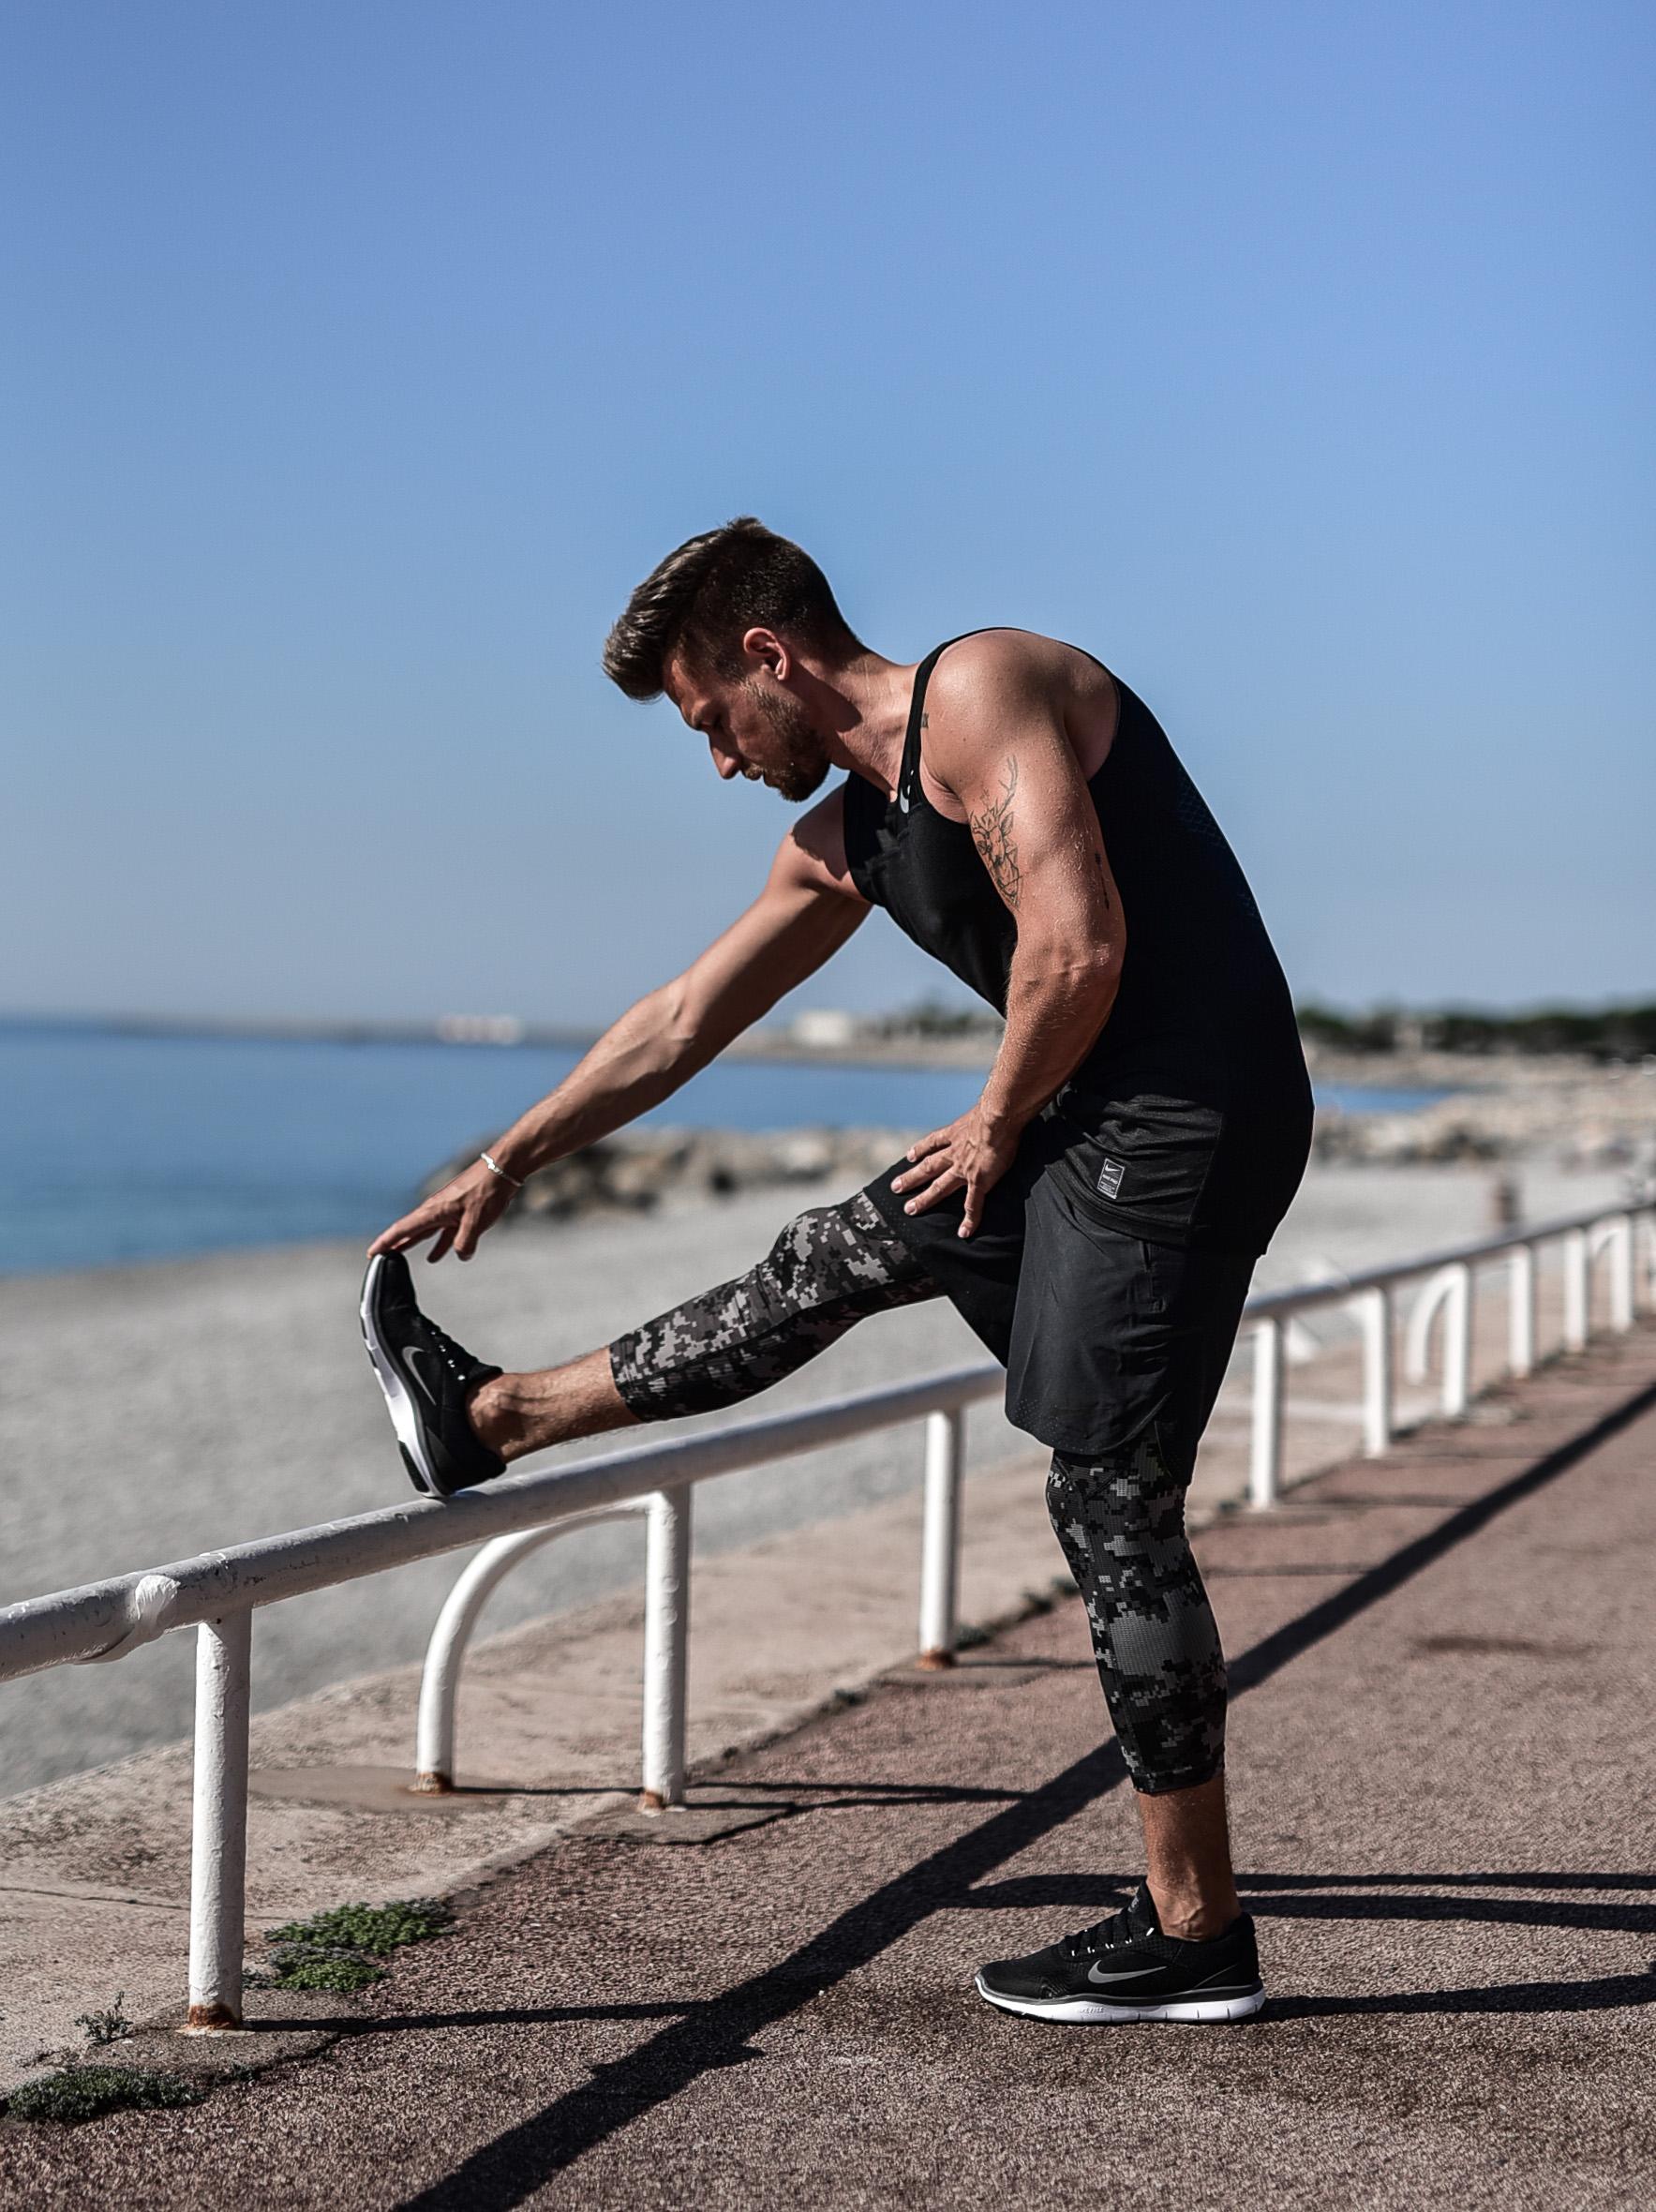 Tommeezjerry-Maennermodeblog-Maennermode-Fashionblog-Styleblog-Berlinblog--Lifestyleblog-Sportswear-Fittnes-Nike-Run-Sportsachen-Nizza-Frankreich-Fitnesswear